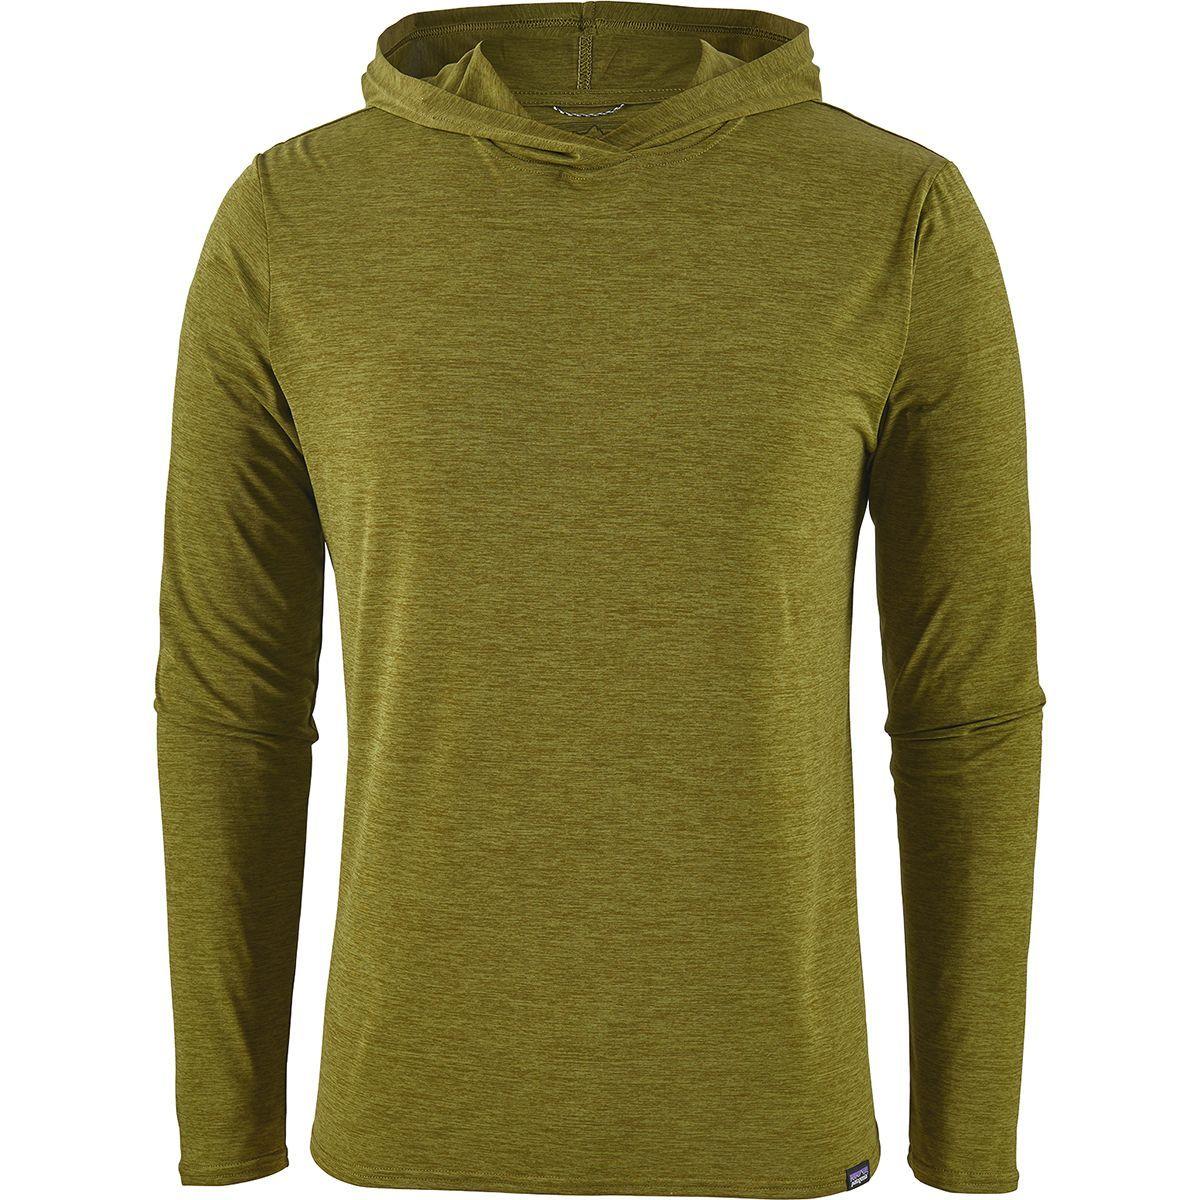 Patagonia Capilene Cool Daily Hooded Shirt - Men's